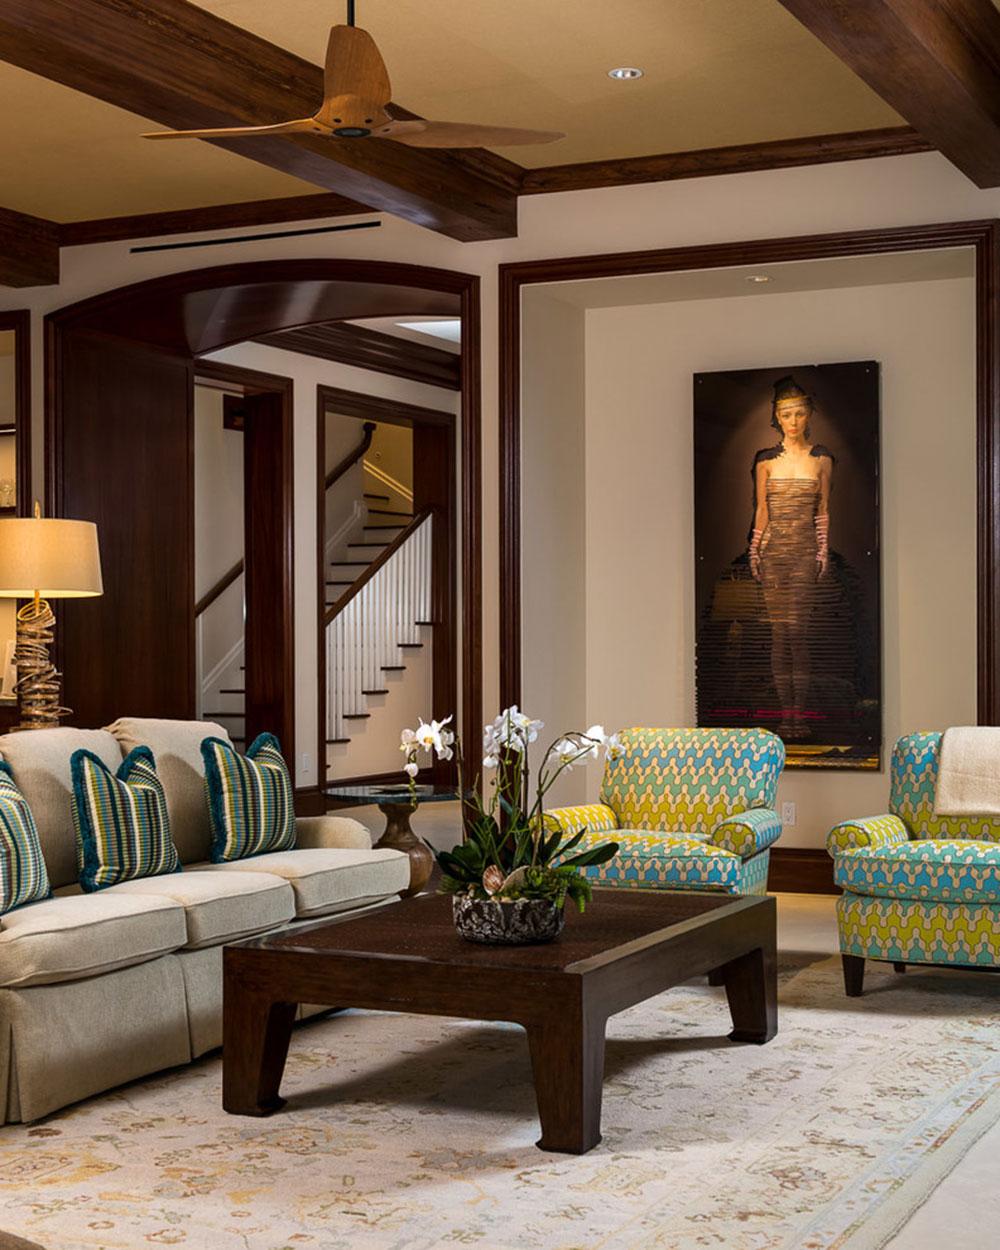 Furniture Arrangement Tips For Stylish Homes4 Furniture Arrangement Tips  For Stylish